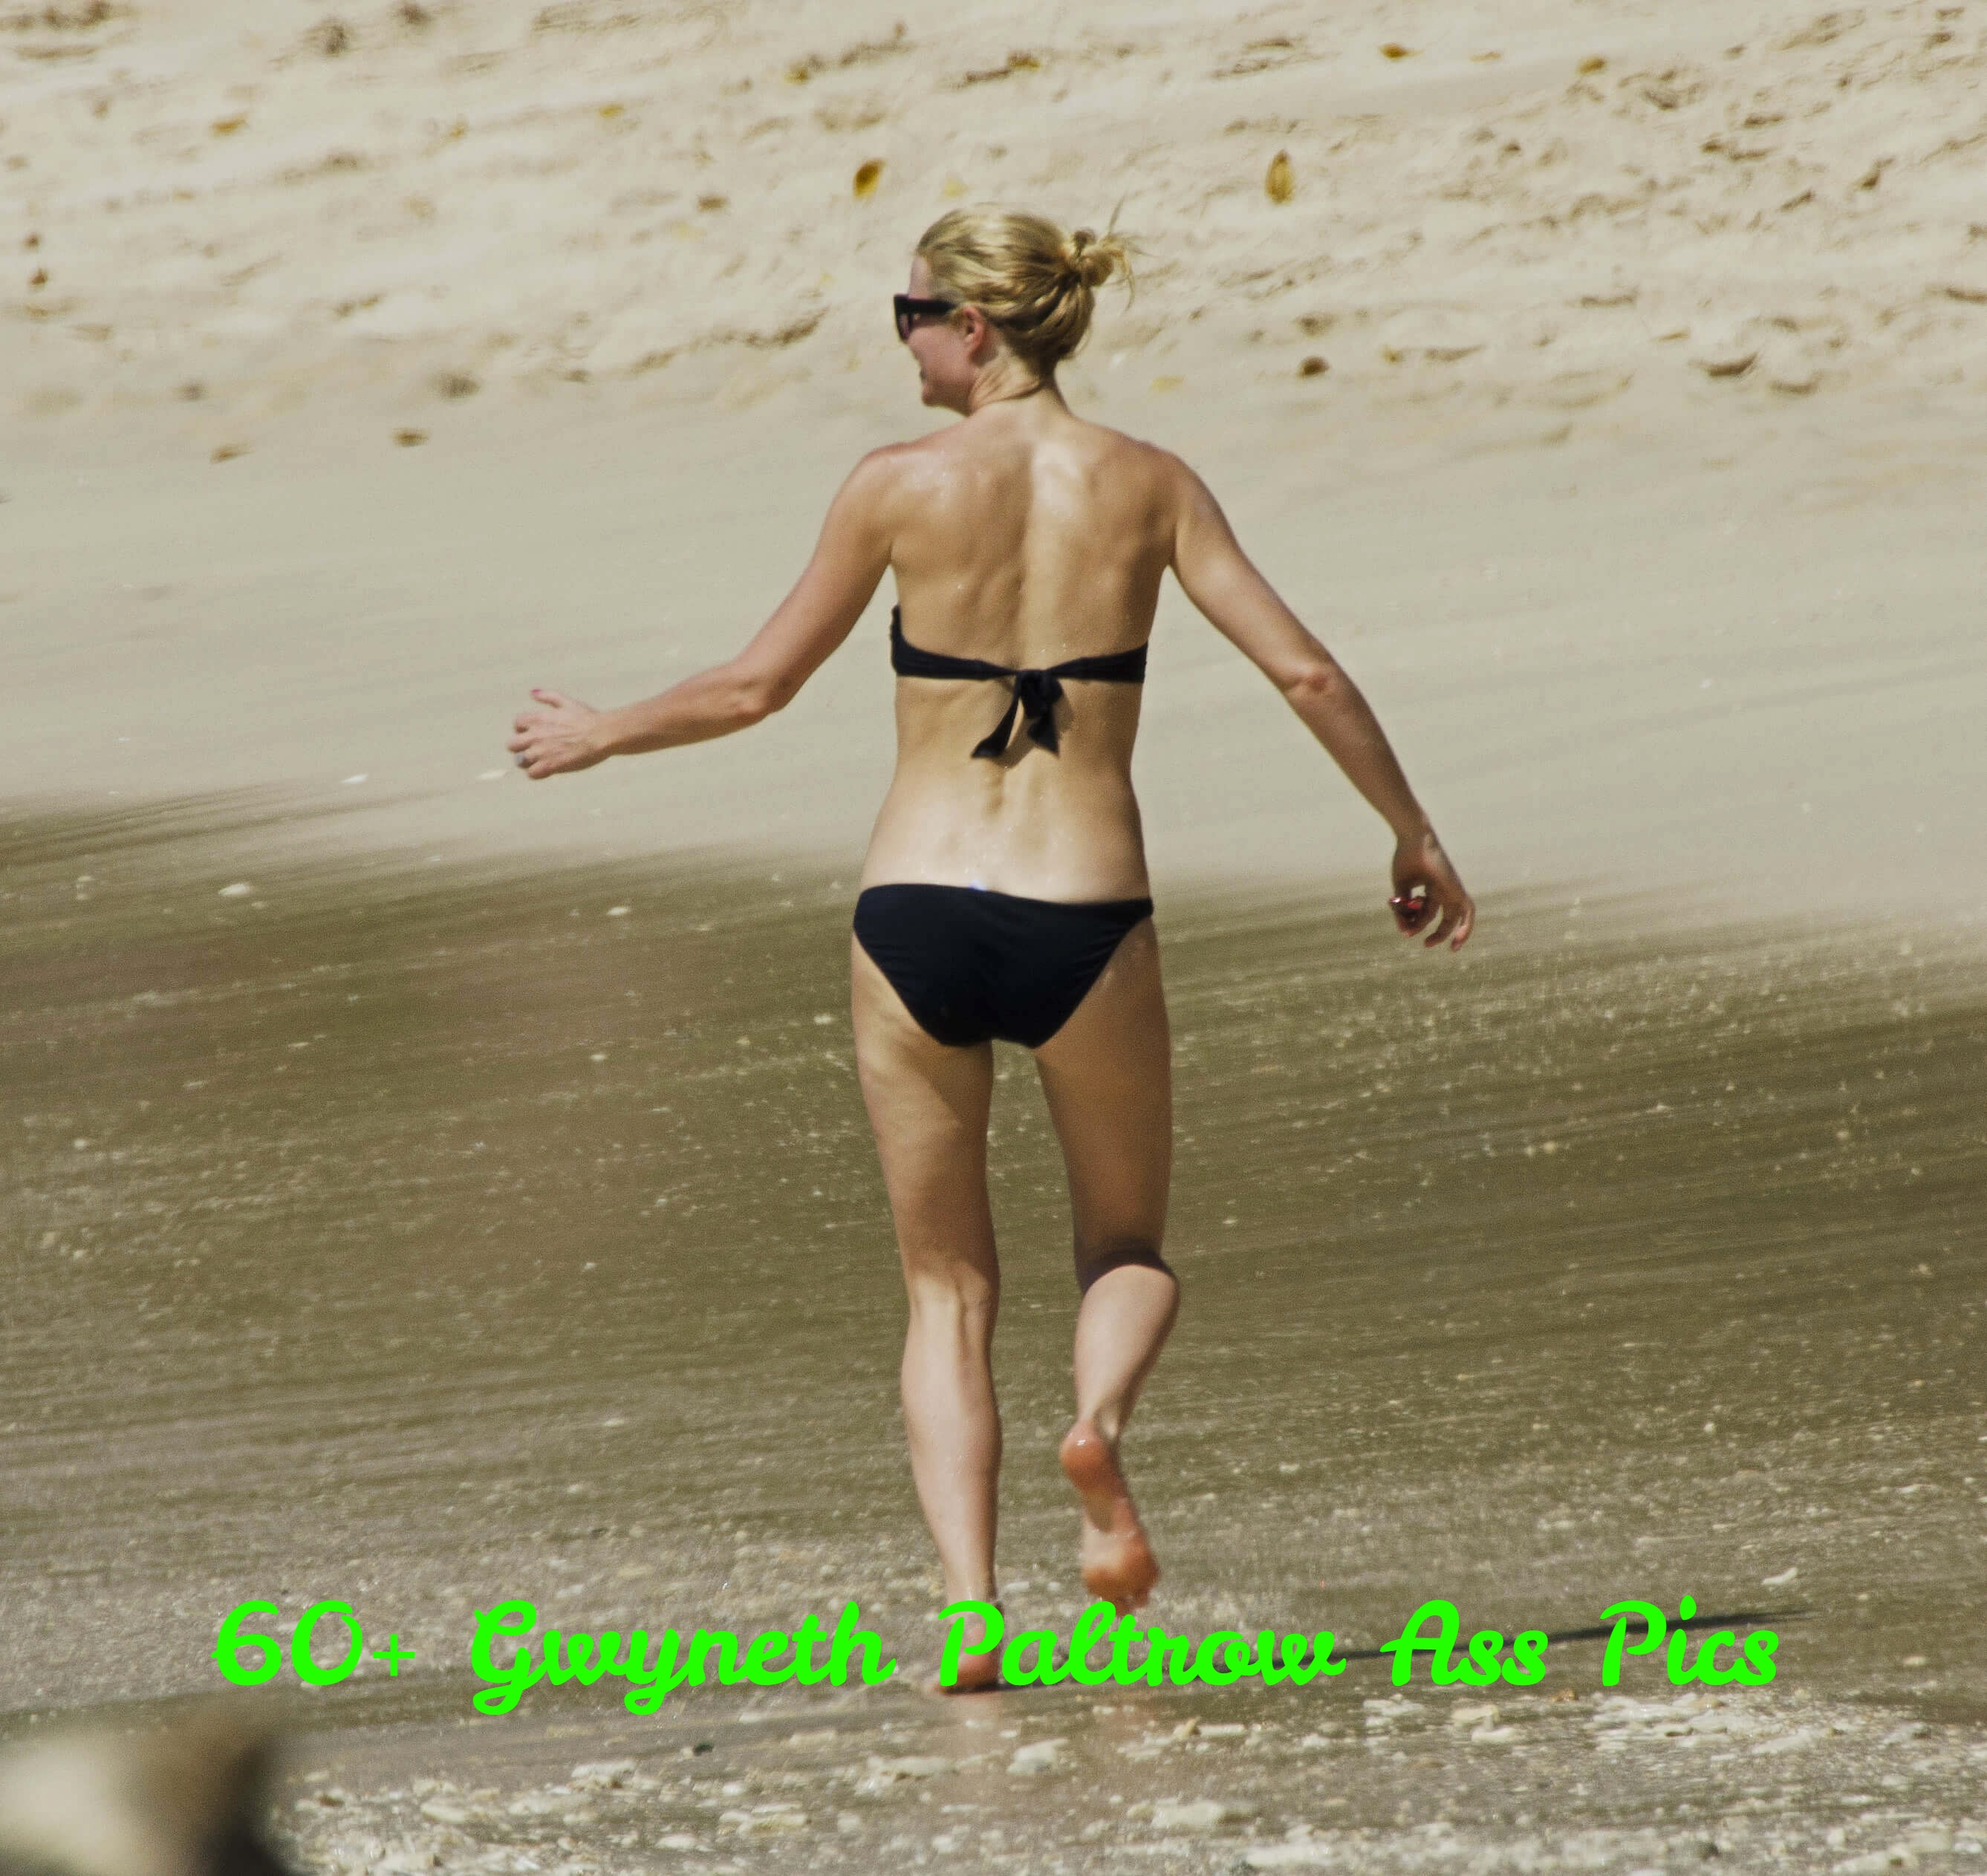 Gwyneth Paltrow ass pics